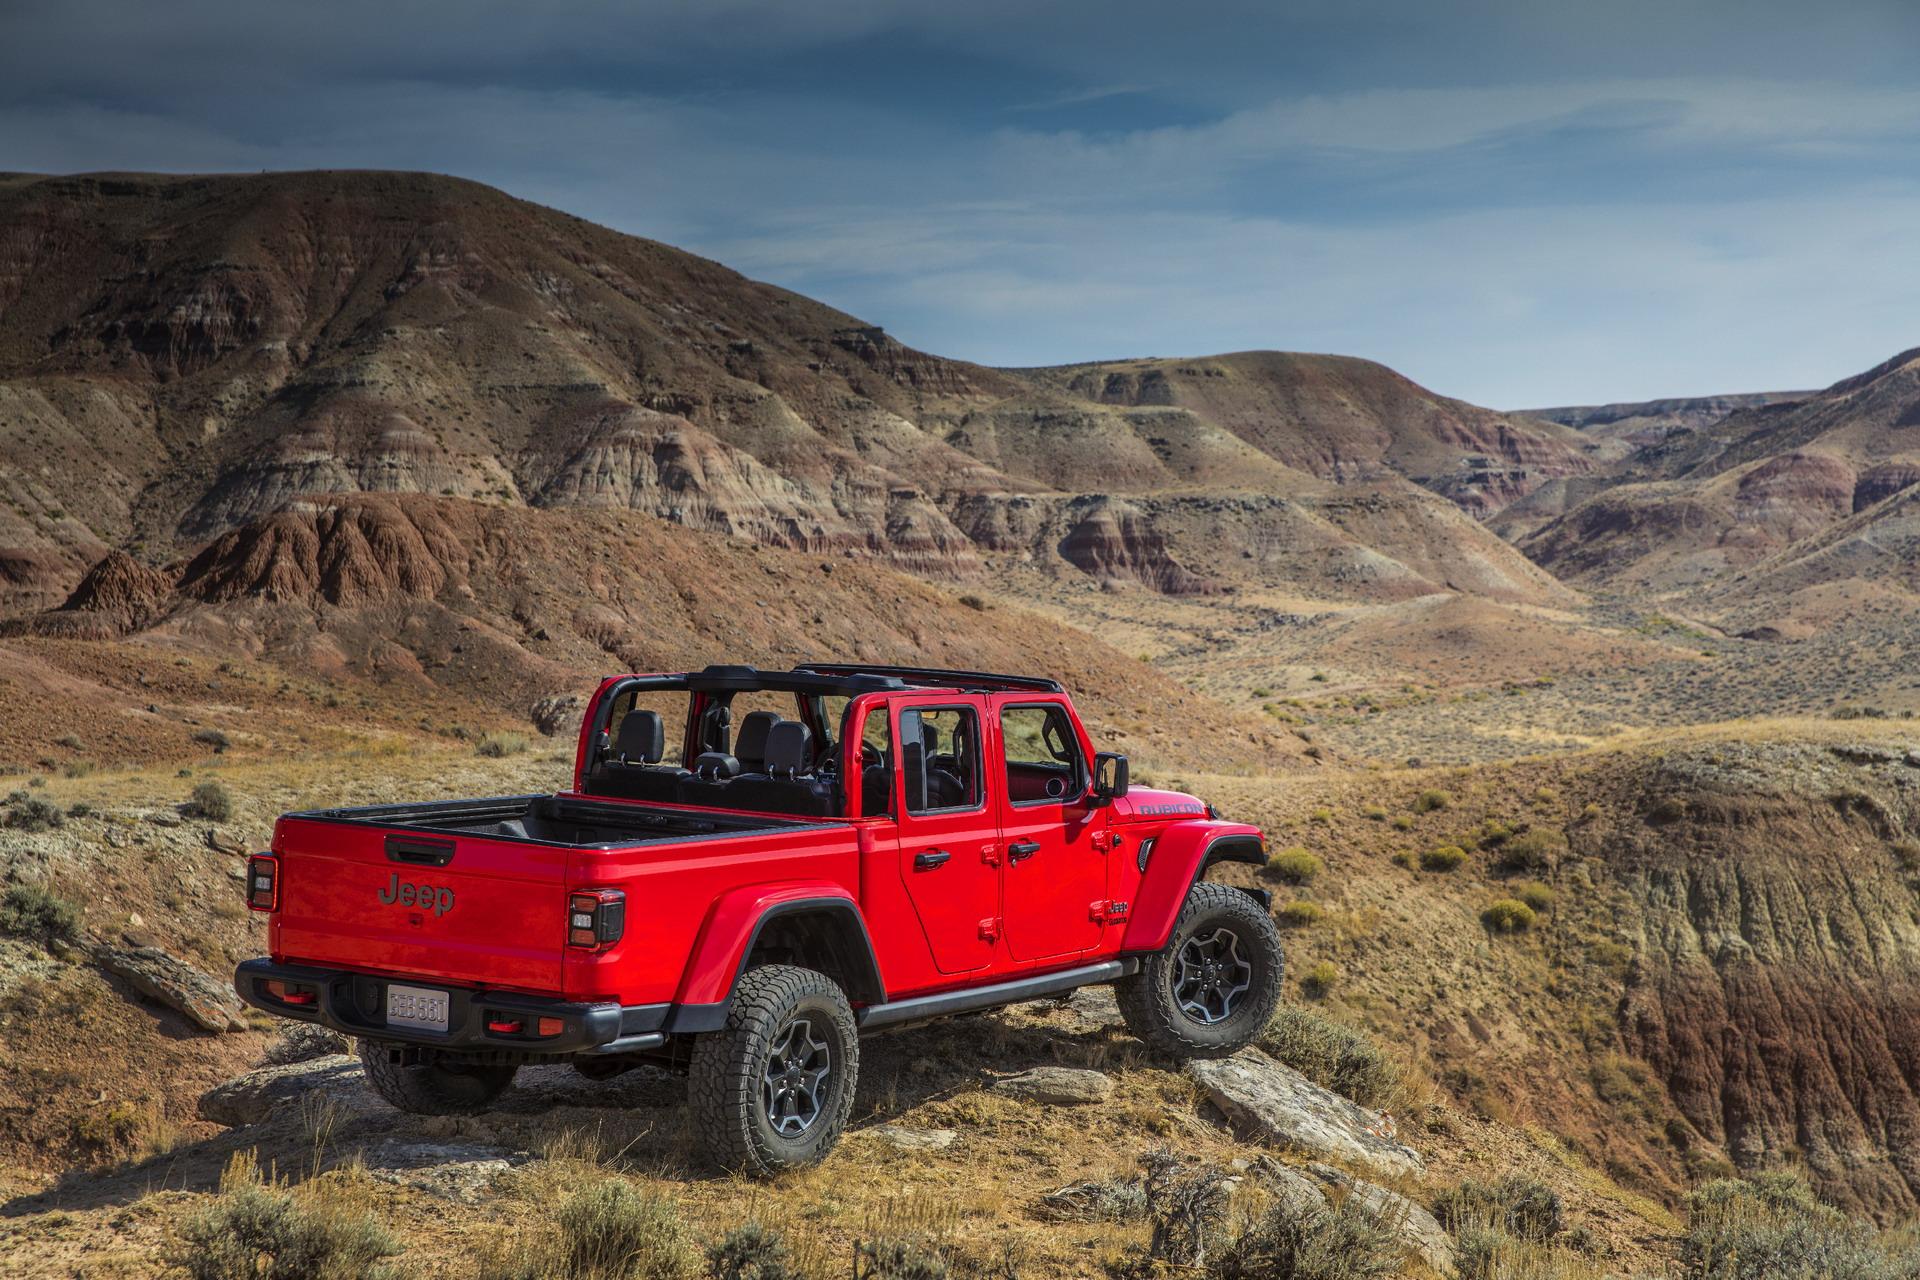 91cd5a45 2020 Jeep Gladiator Truck 44